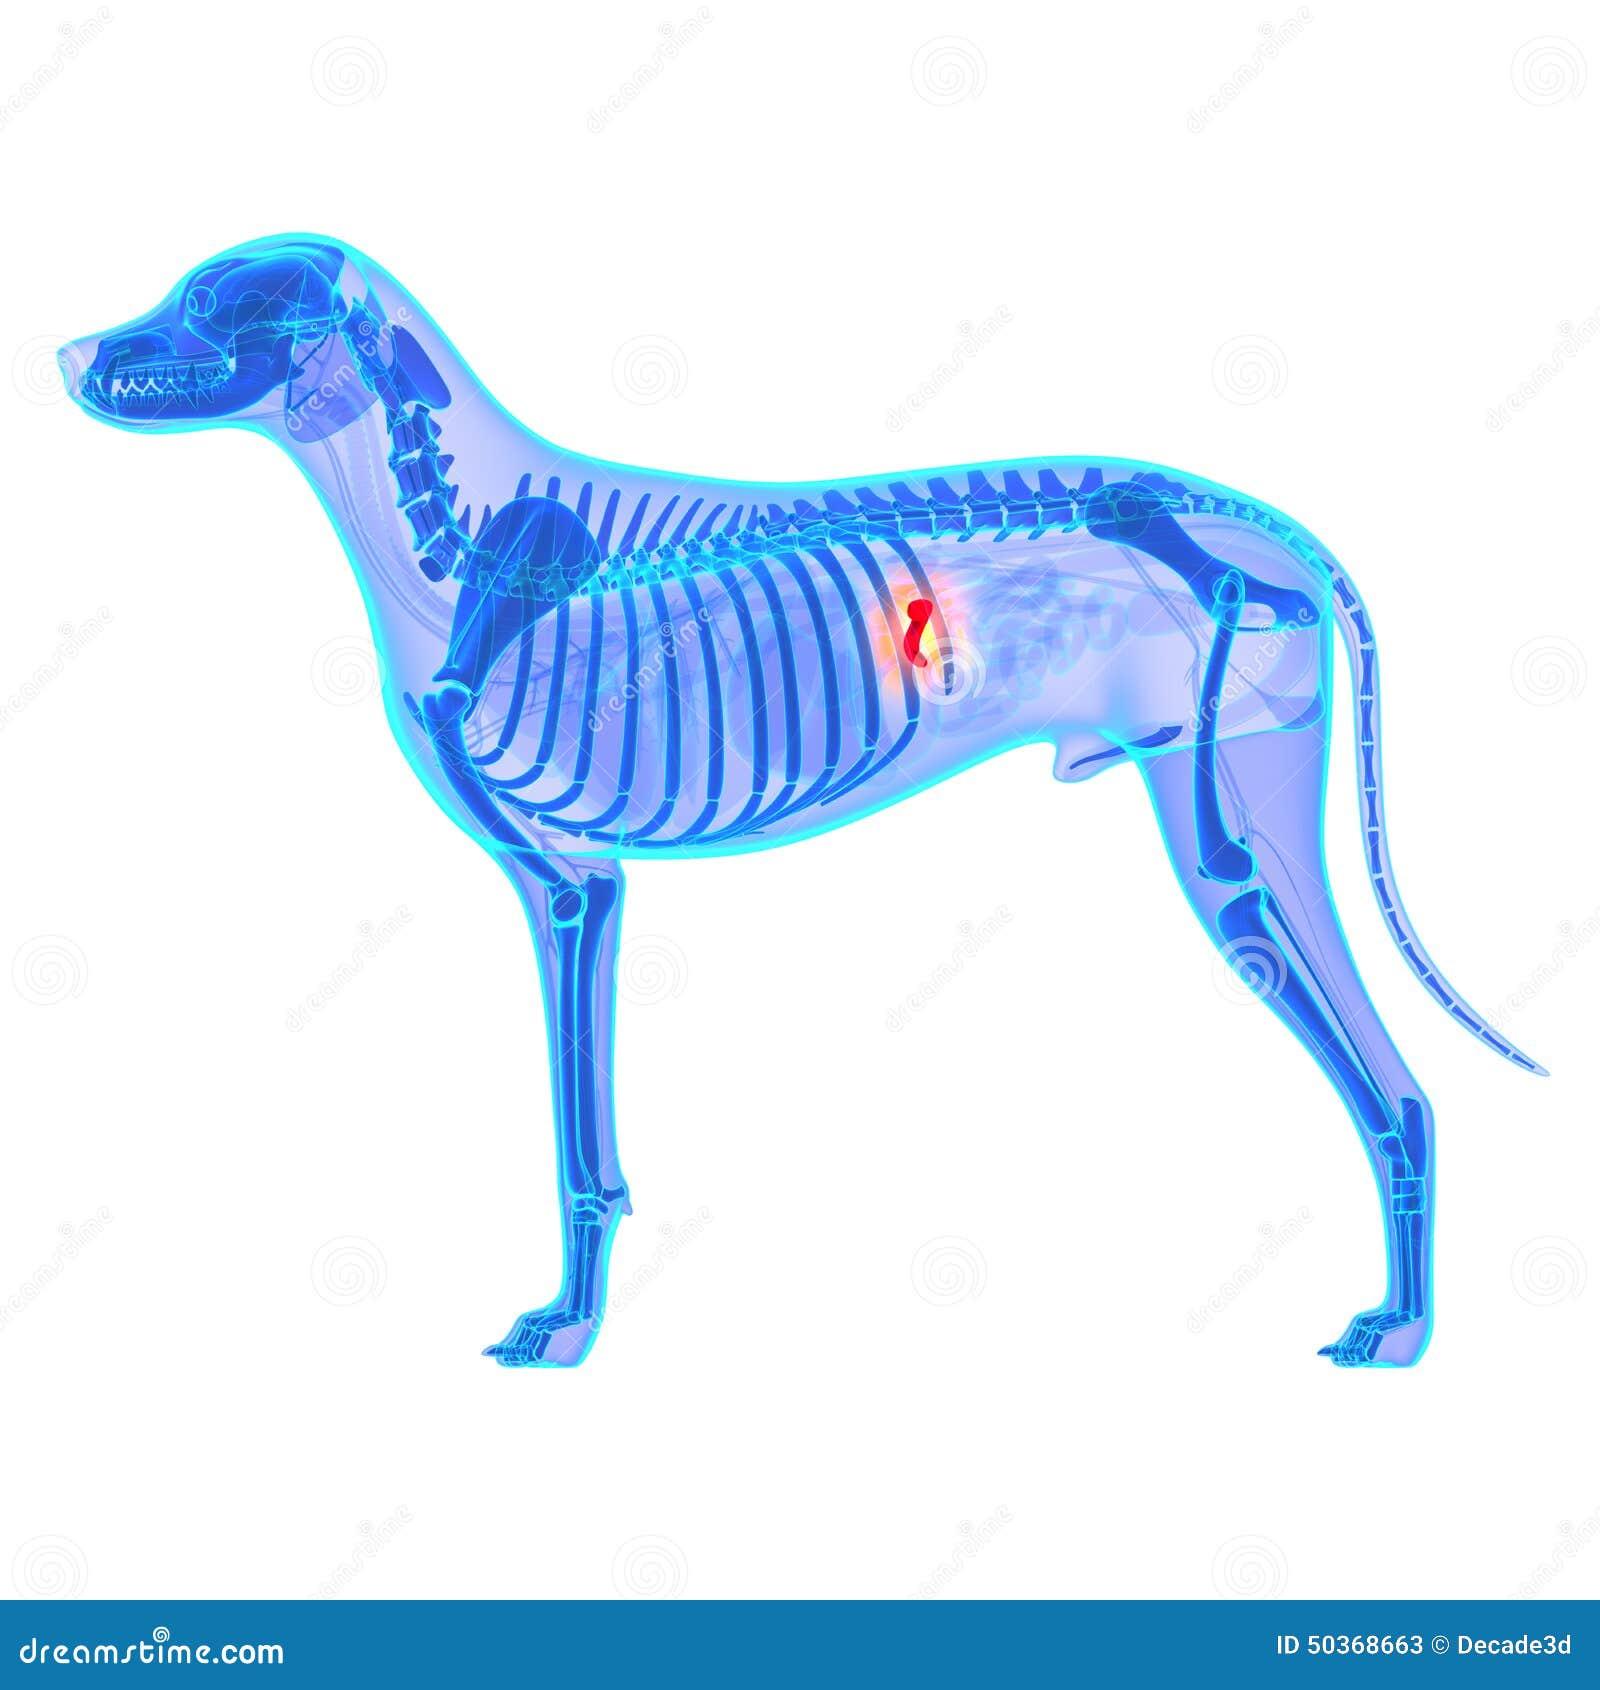 Dog Gallbladder Anatomy - Canis Lupus Familiaris Anatomy - Isola ...